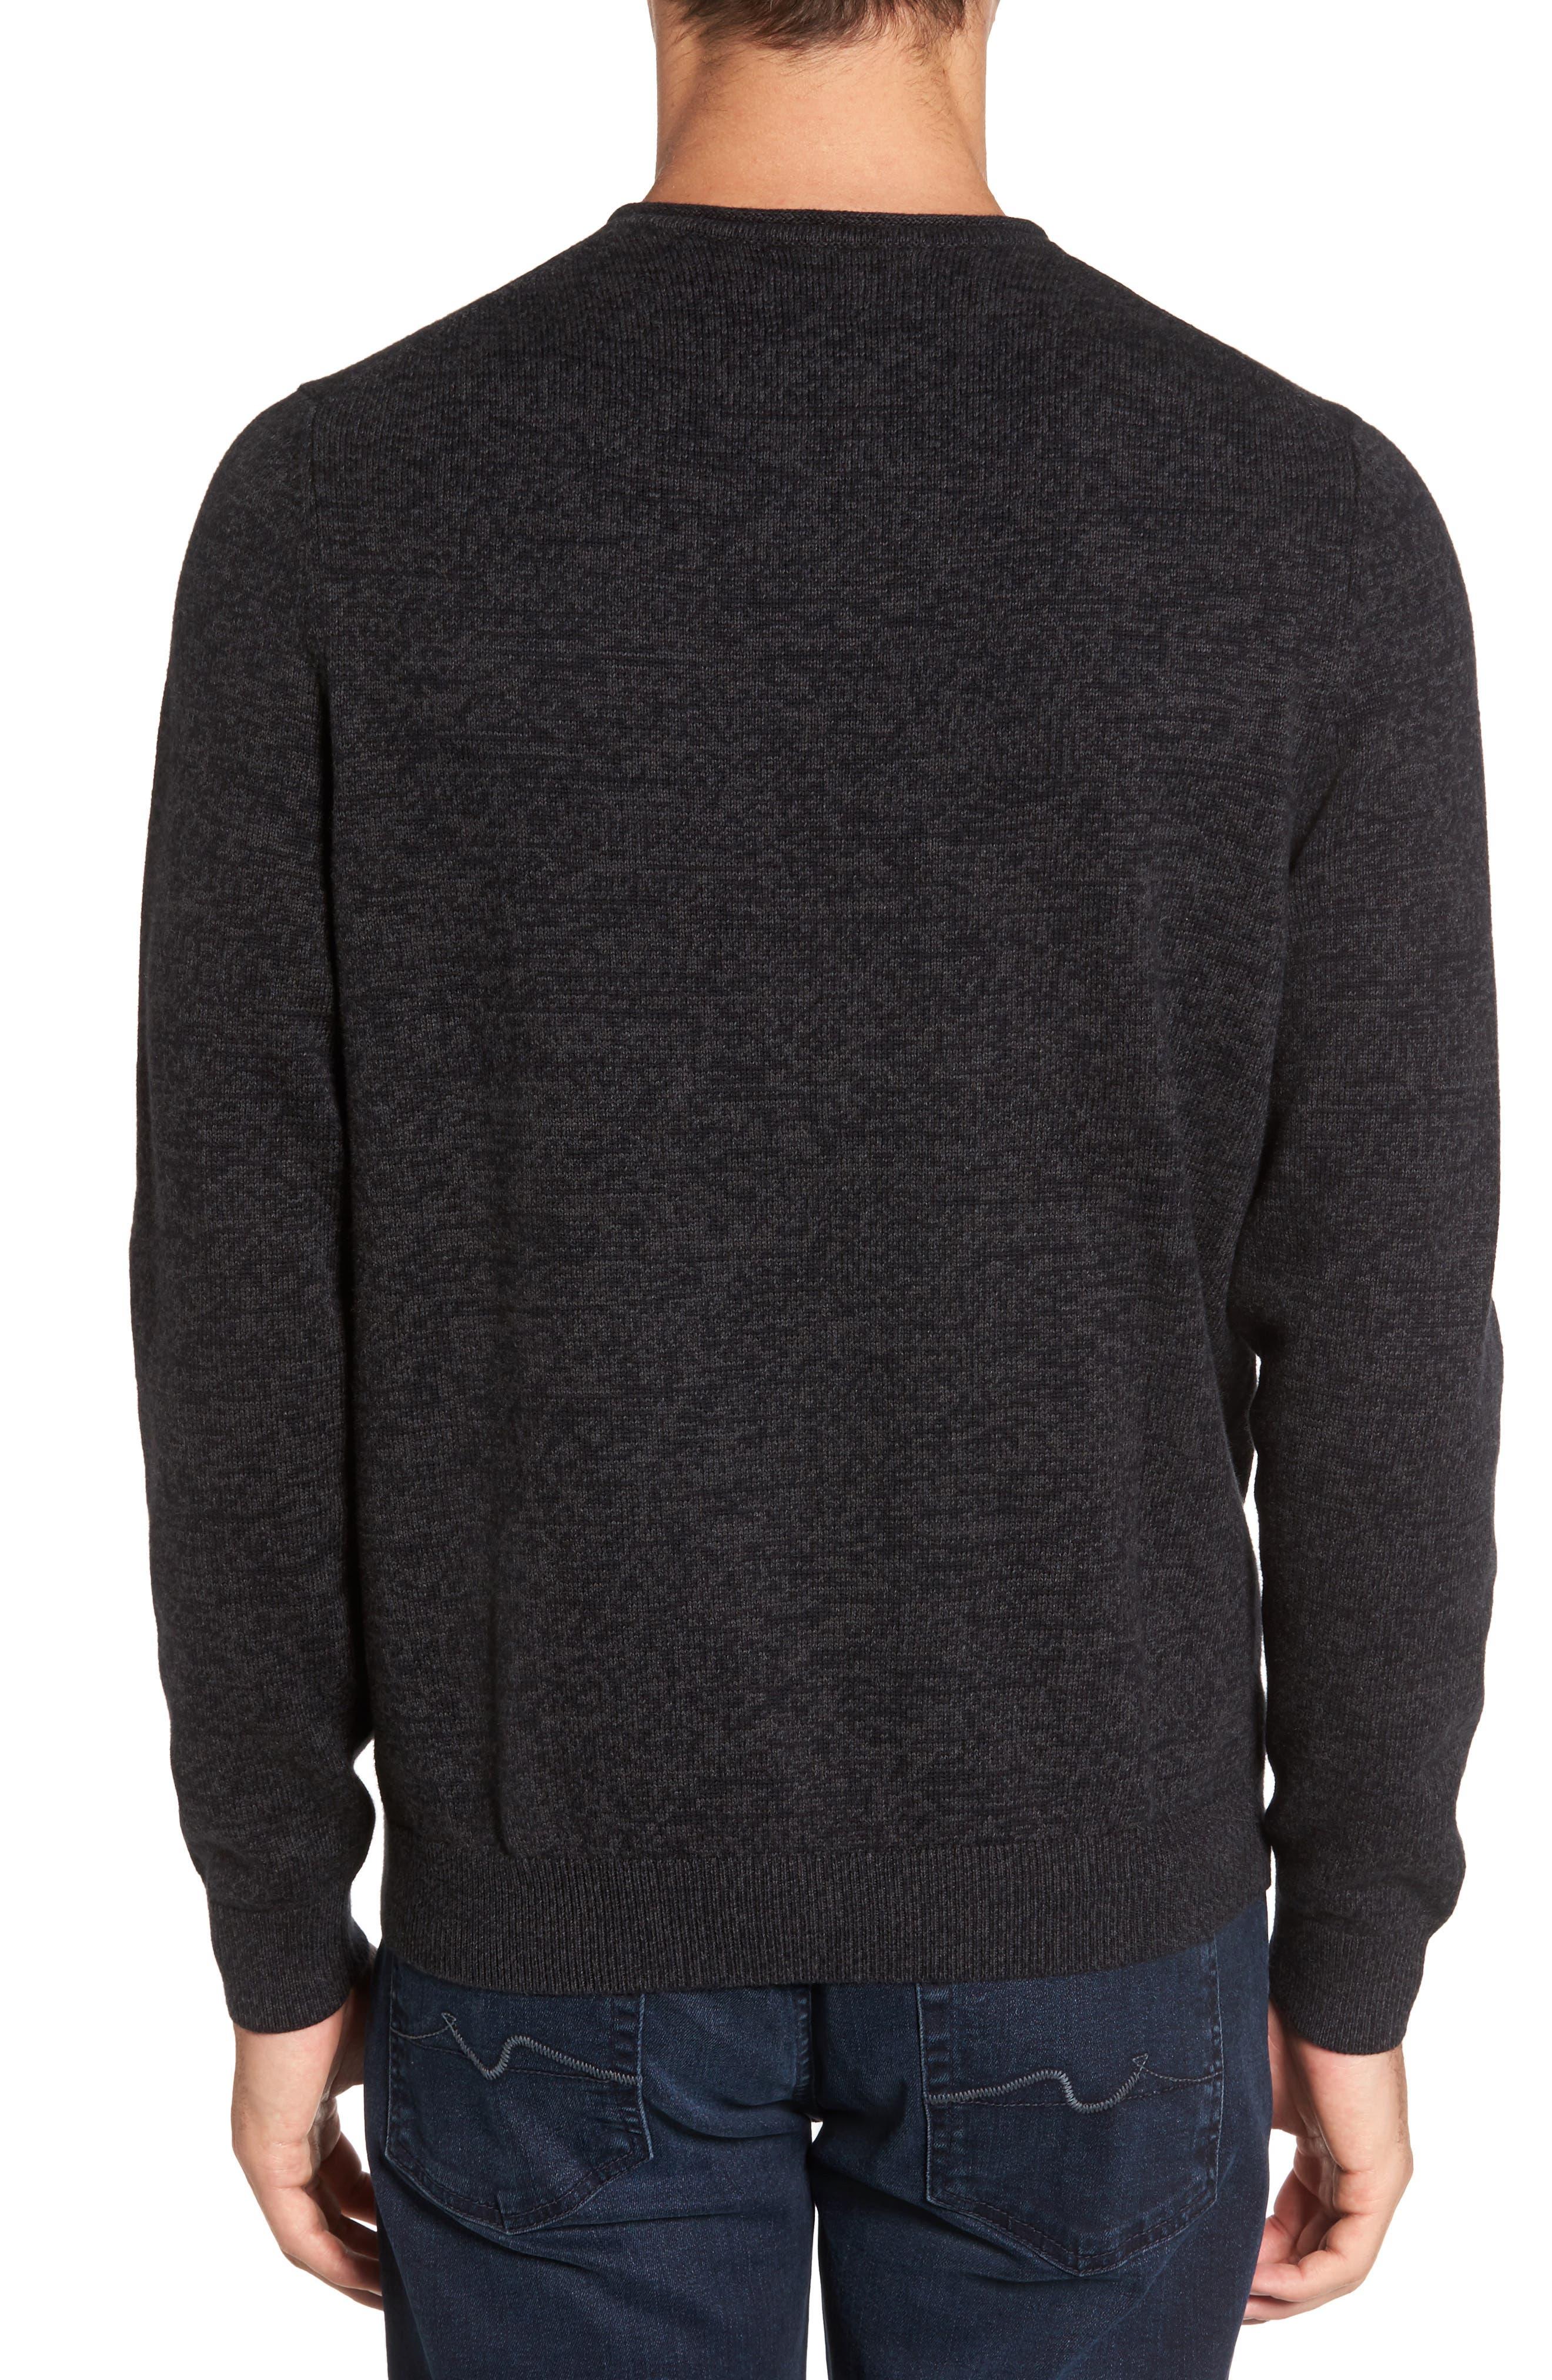 Cotton & Cashmere Roll Neck Sweater,                             Alternate thumbnail 2, color,                             021